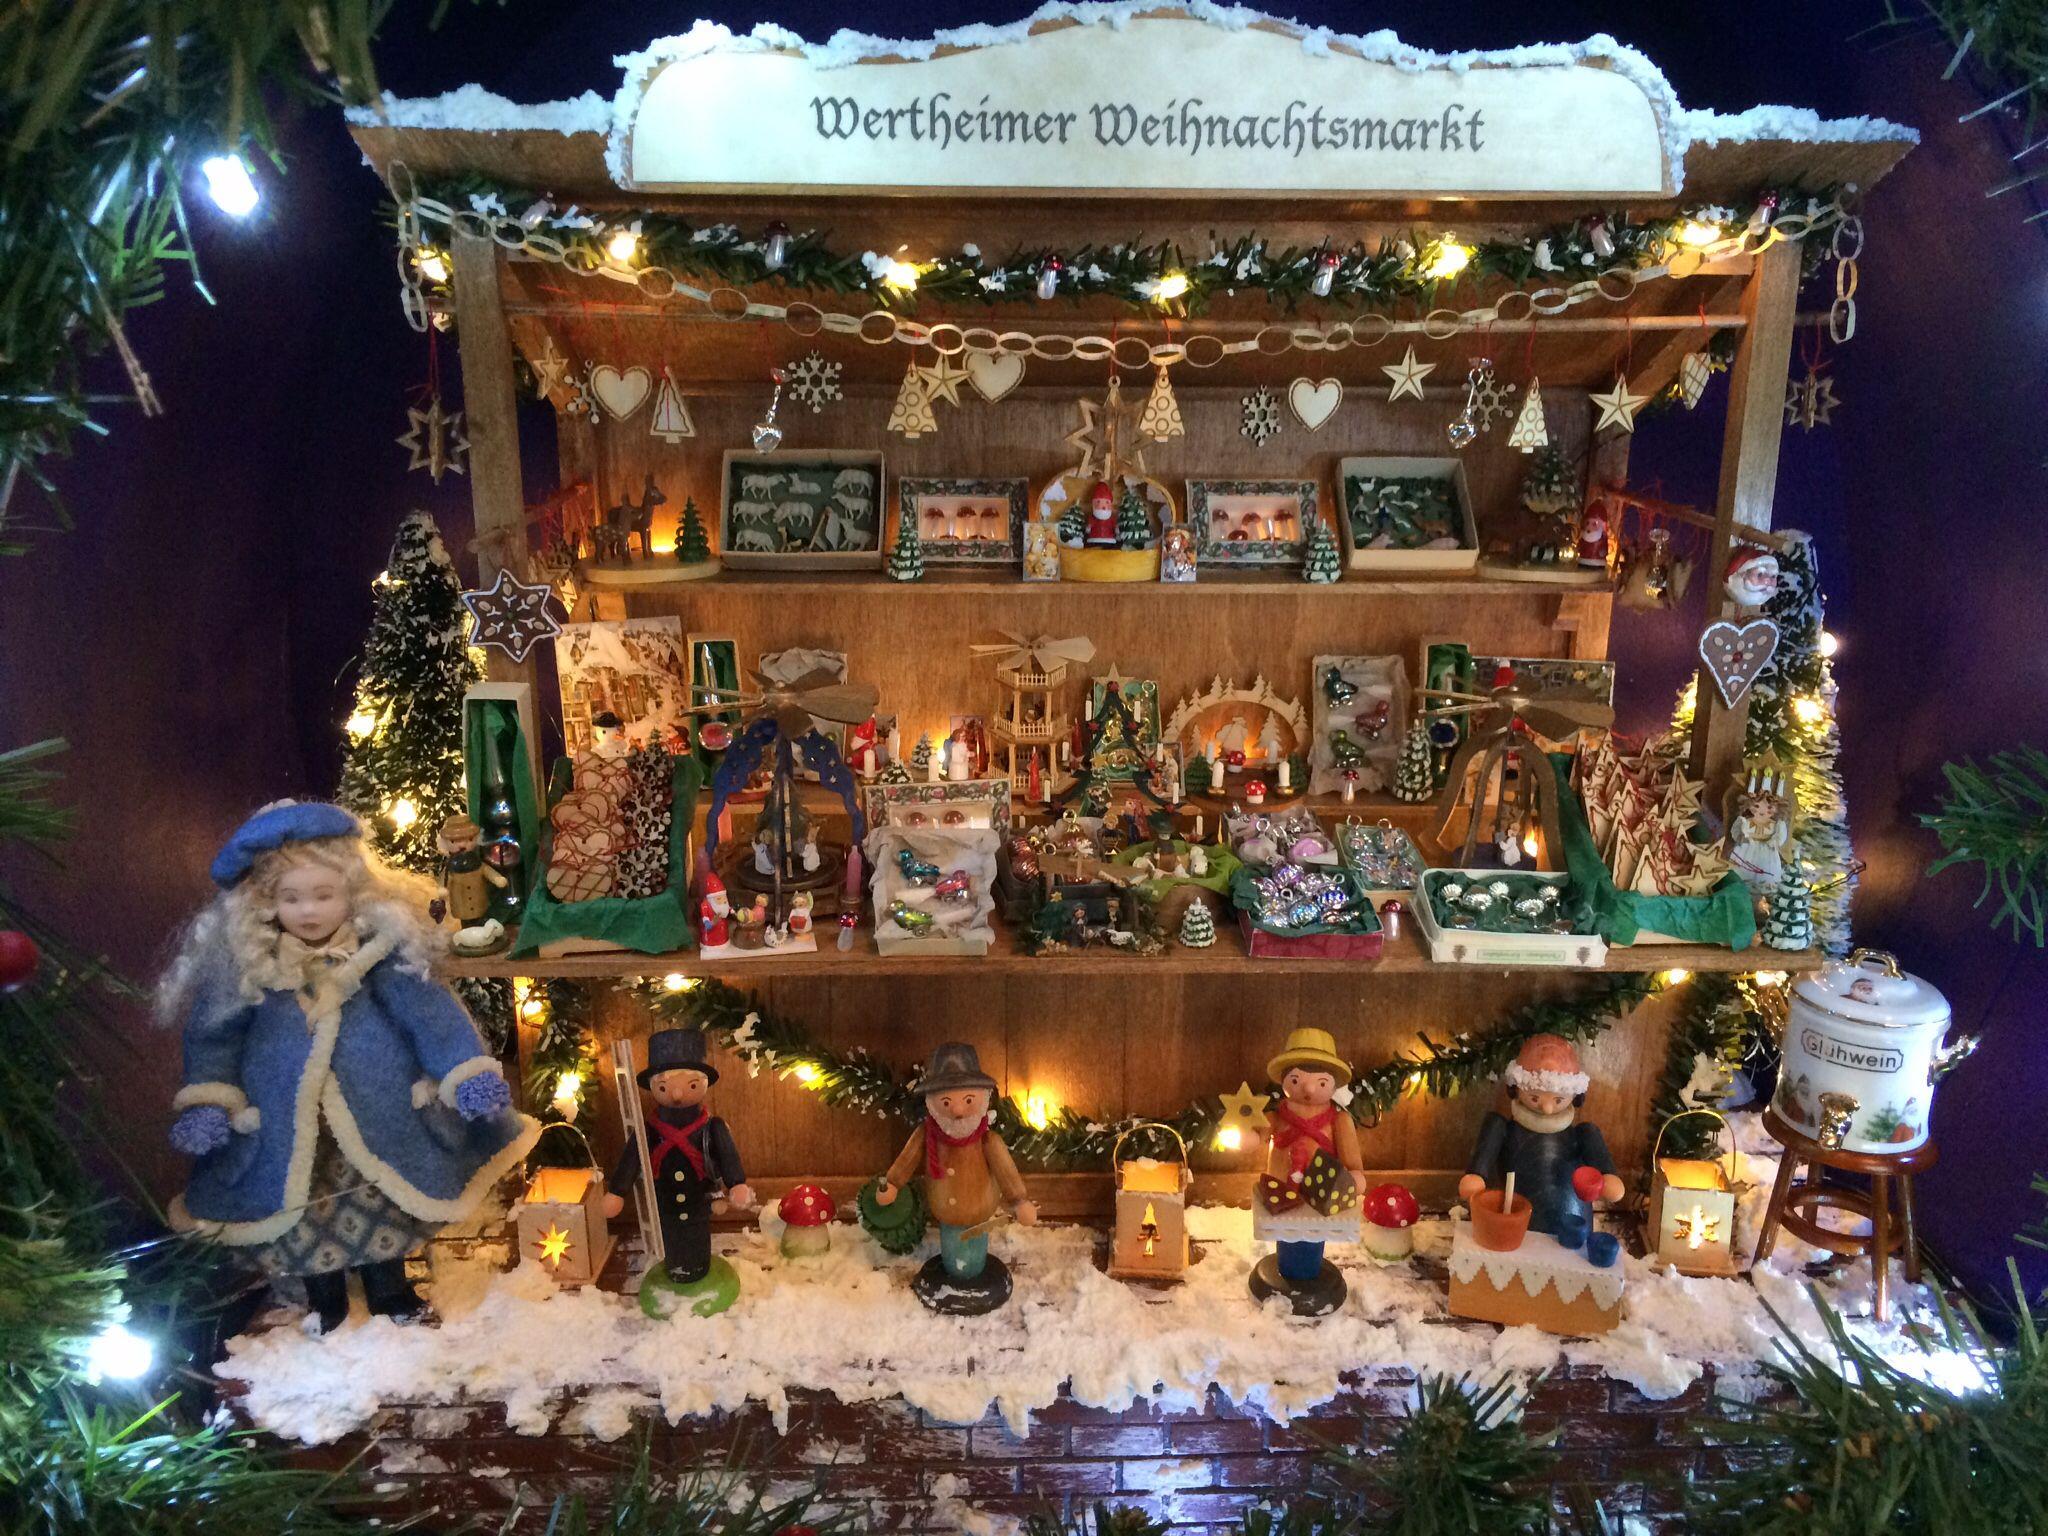 8eff9c5457c Miniatura Navideña · Habitaciones En Miniatura · Miniature German Christmas  Market Stall